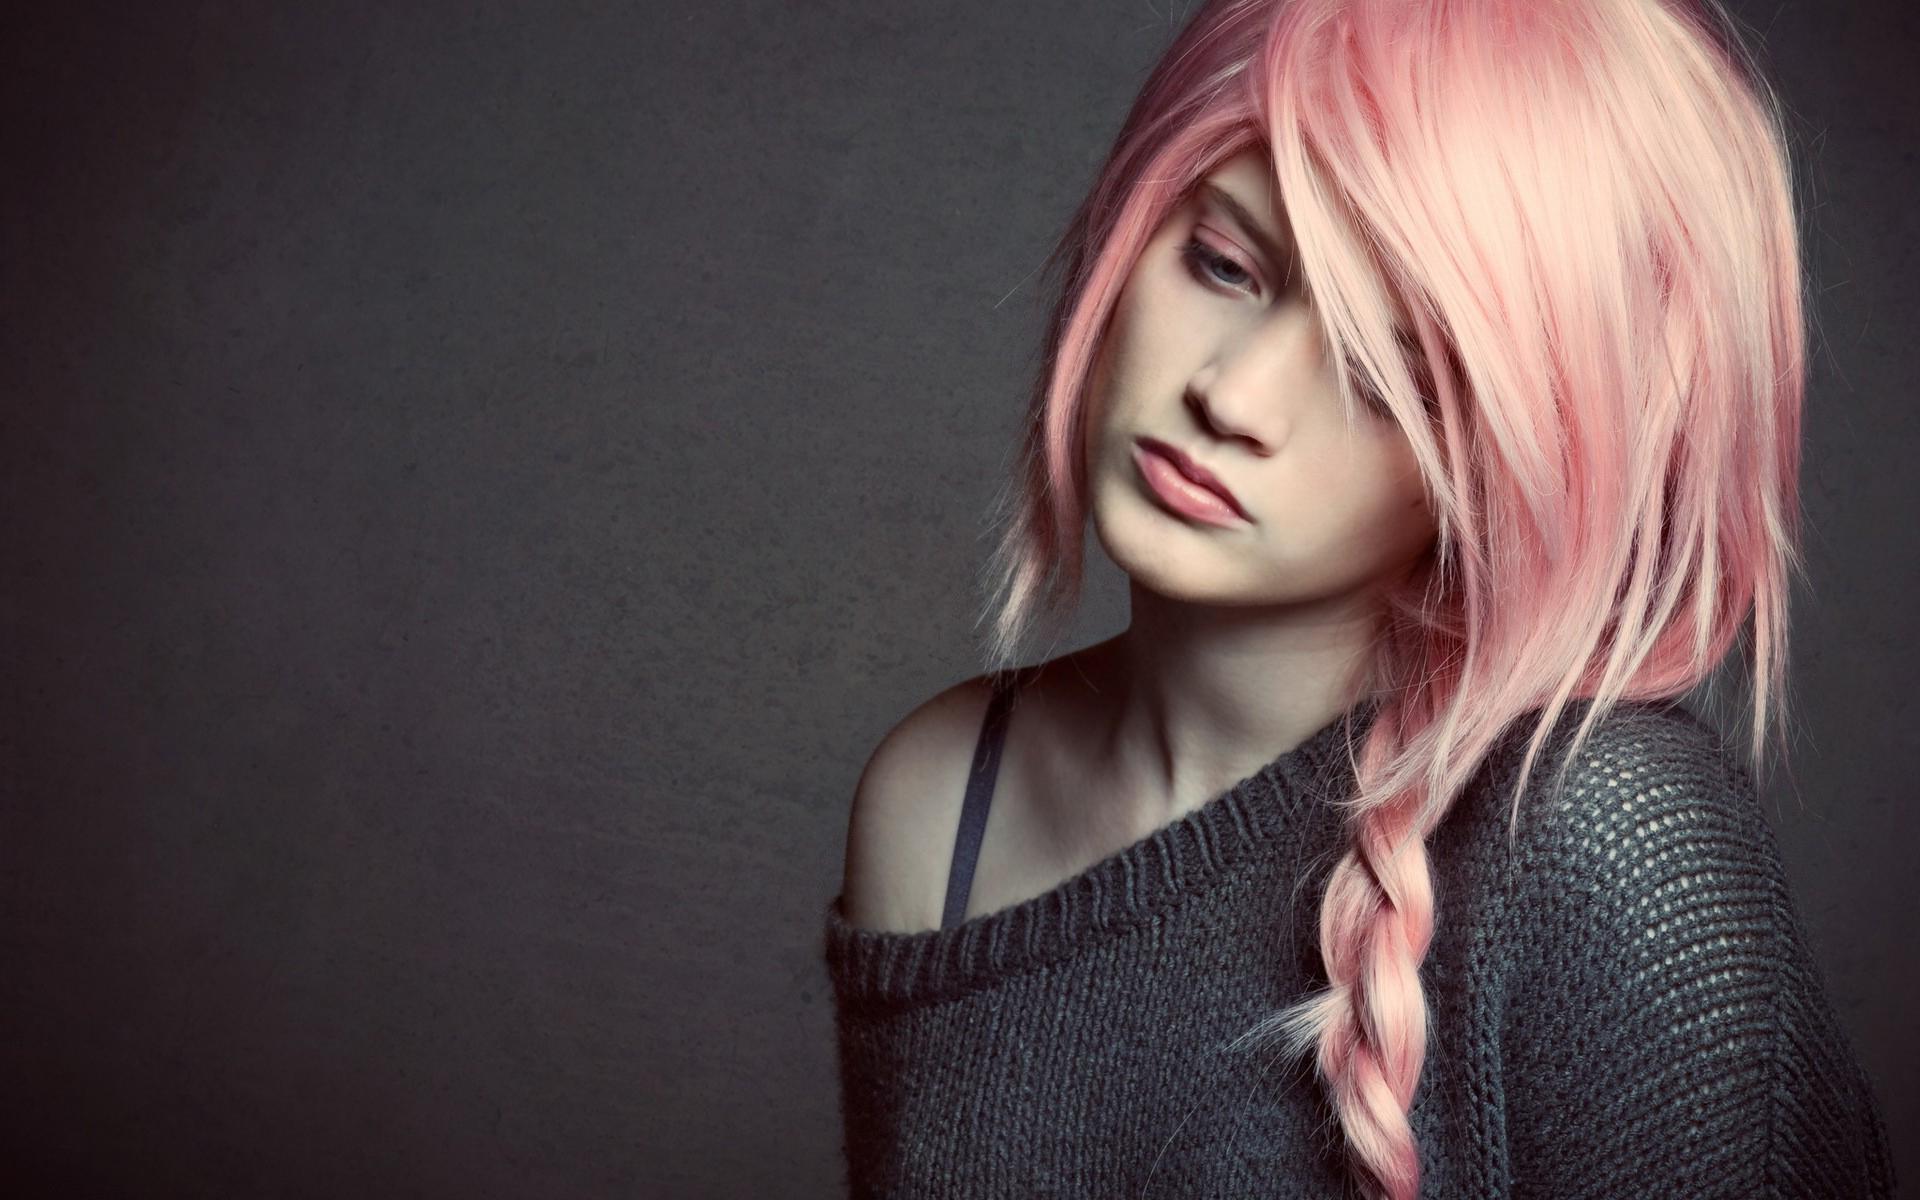 Girl pink hair